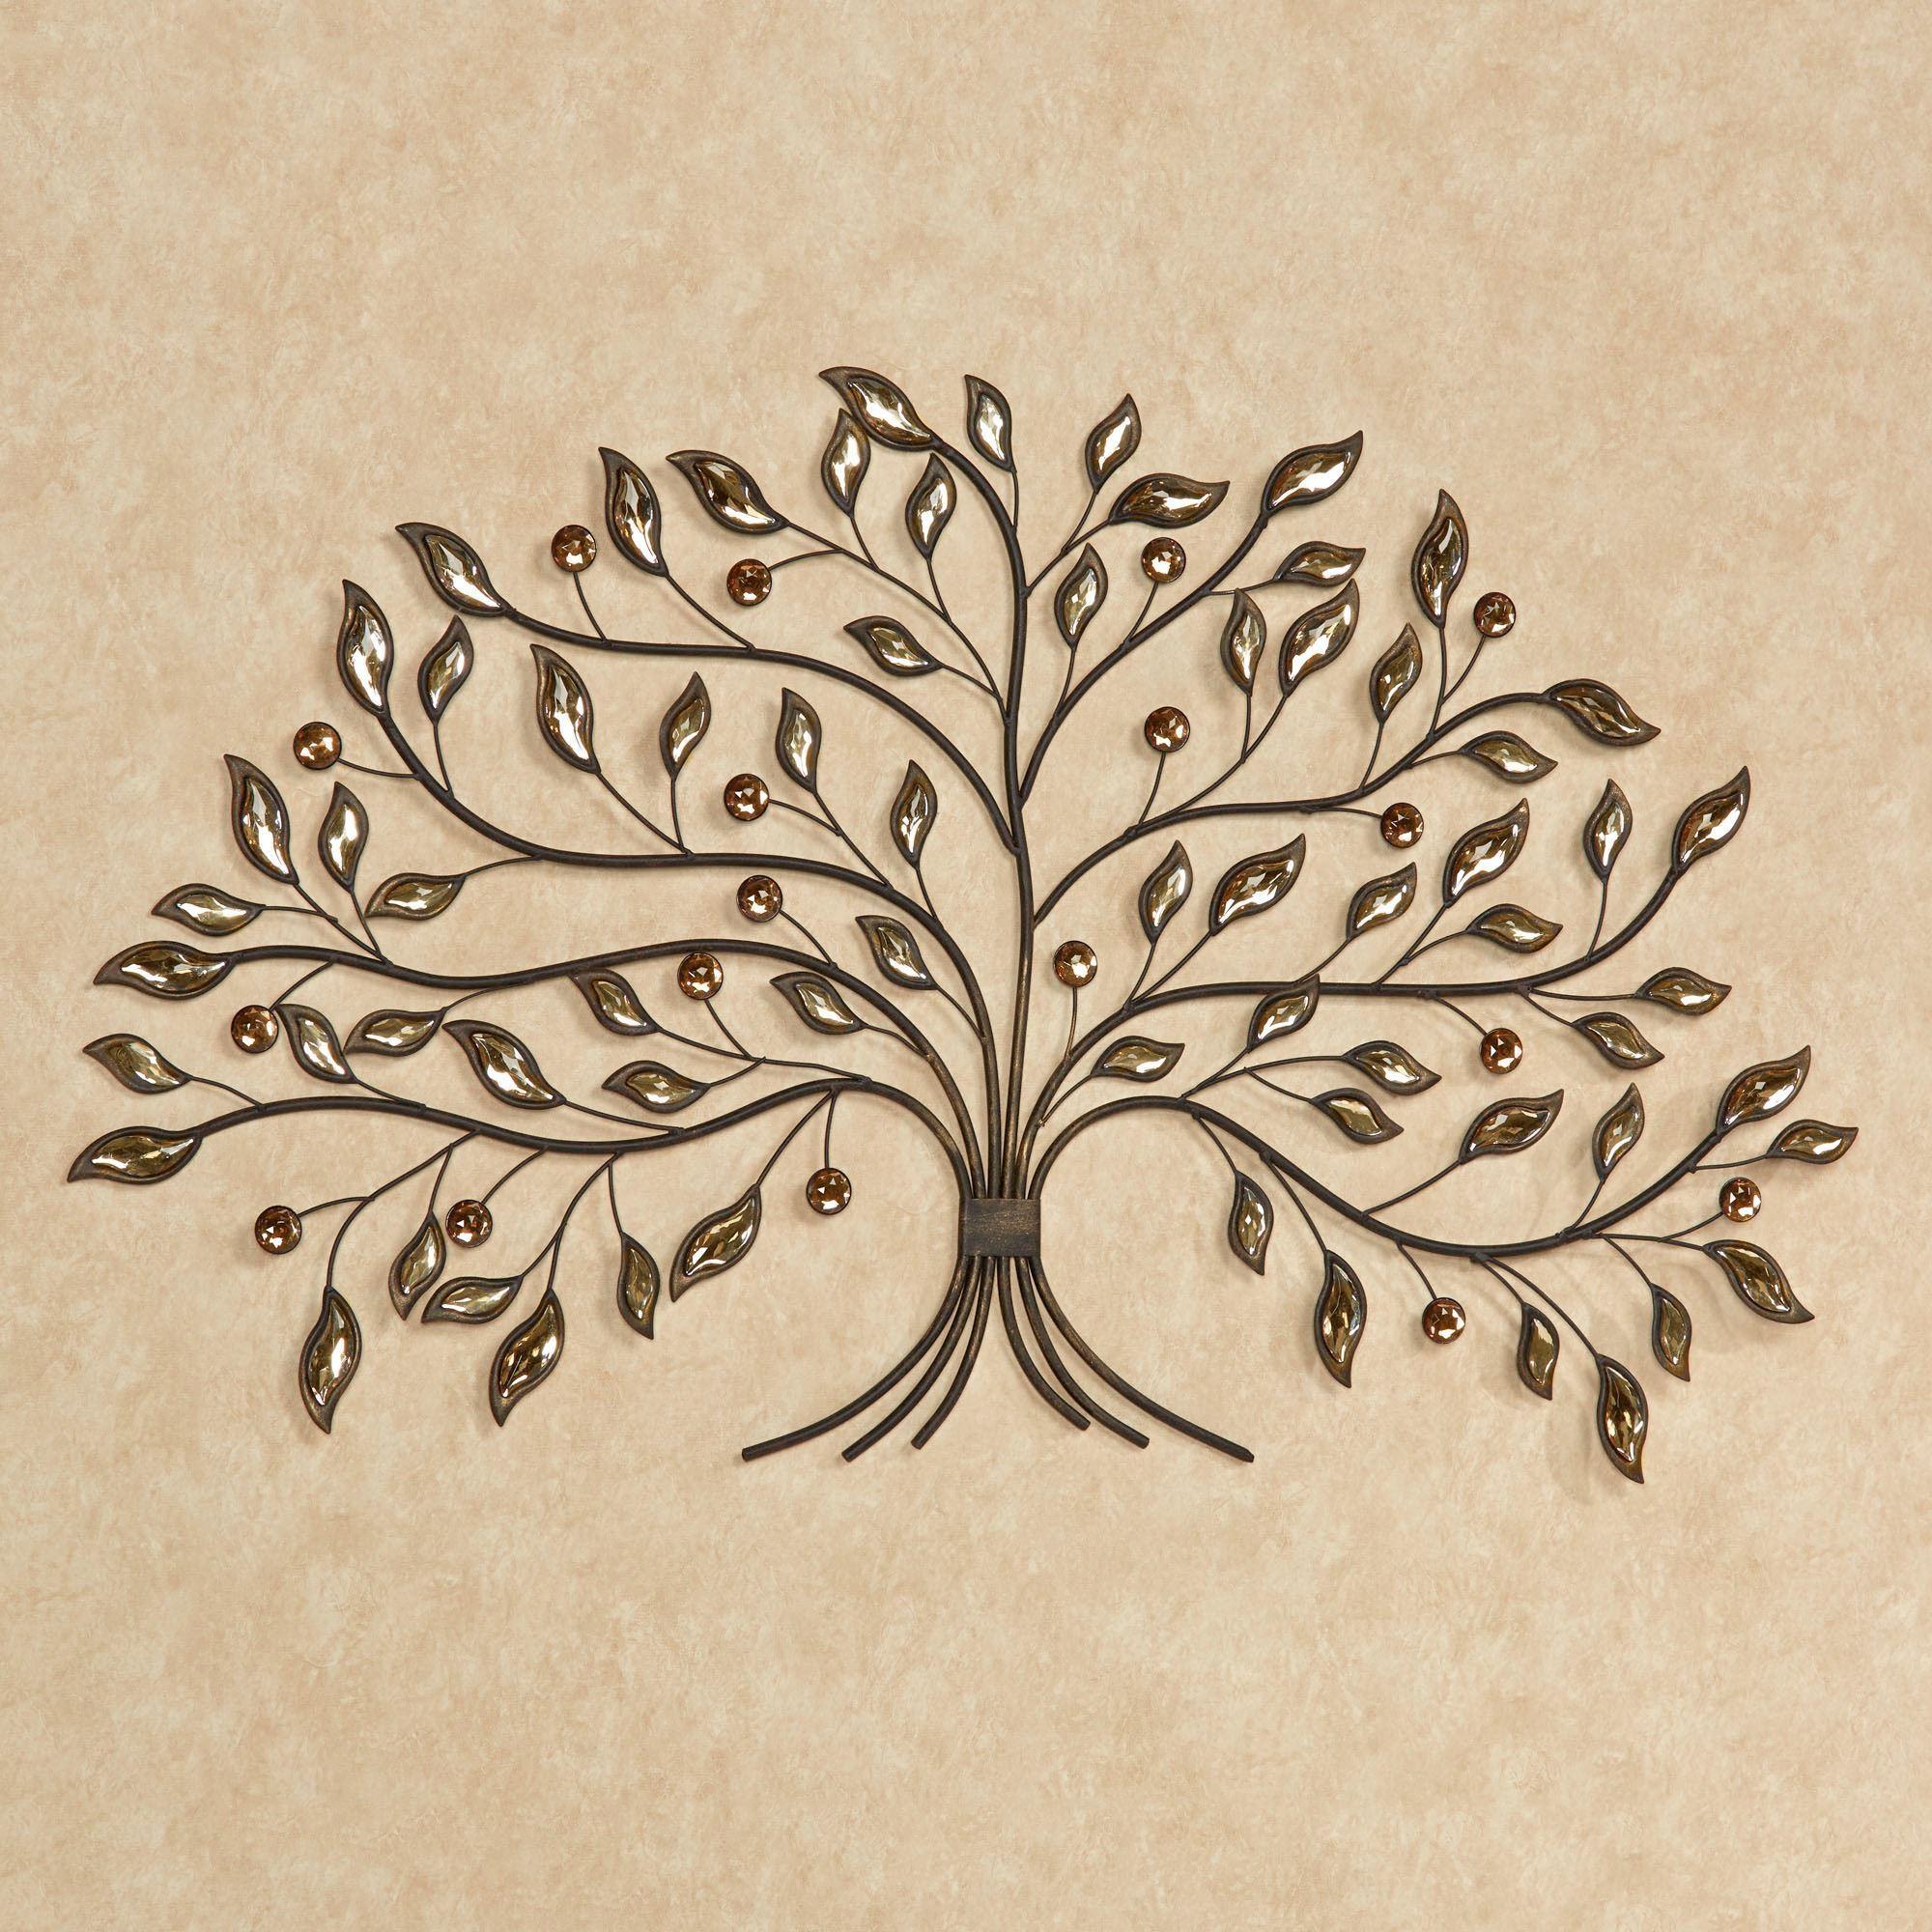 Alexandra Vining Gem Tree Metal Wall Art For Elements Wall Art (Image 2 of 20)